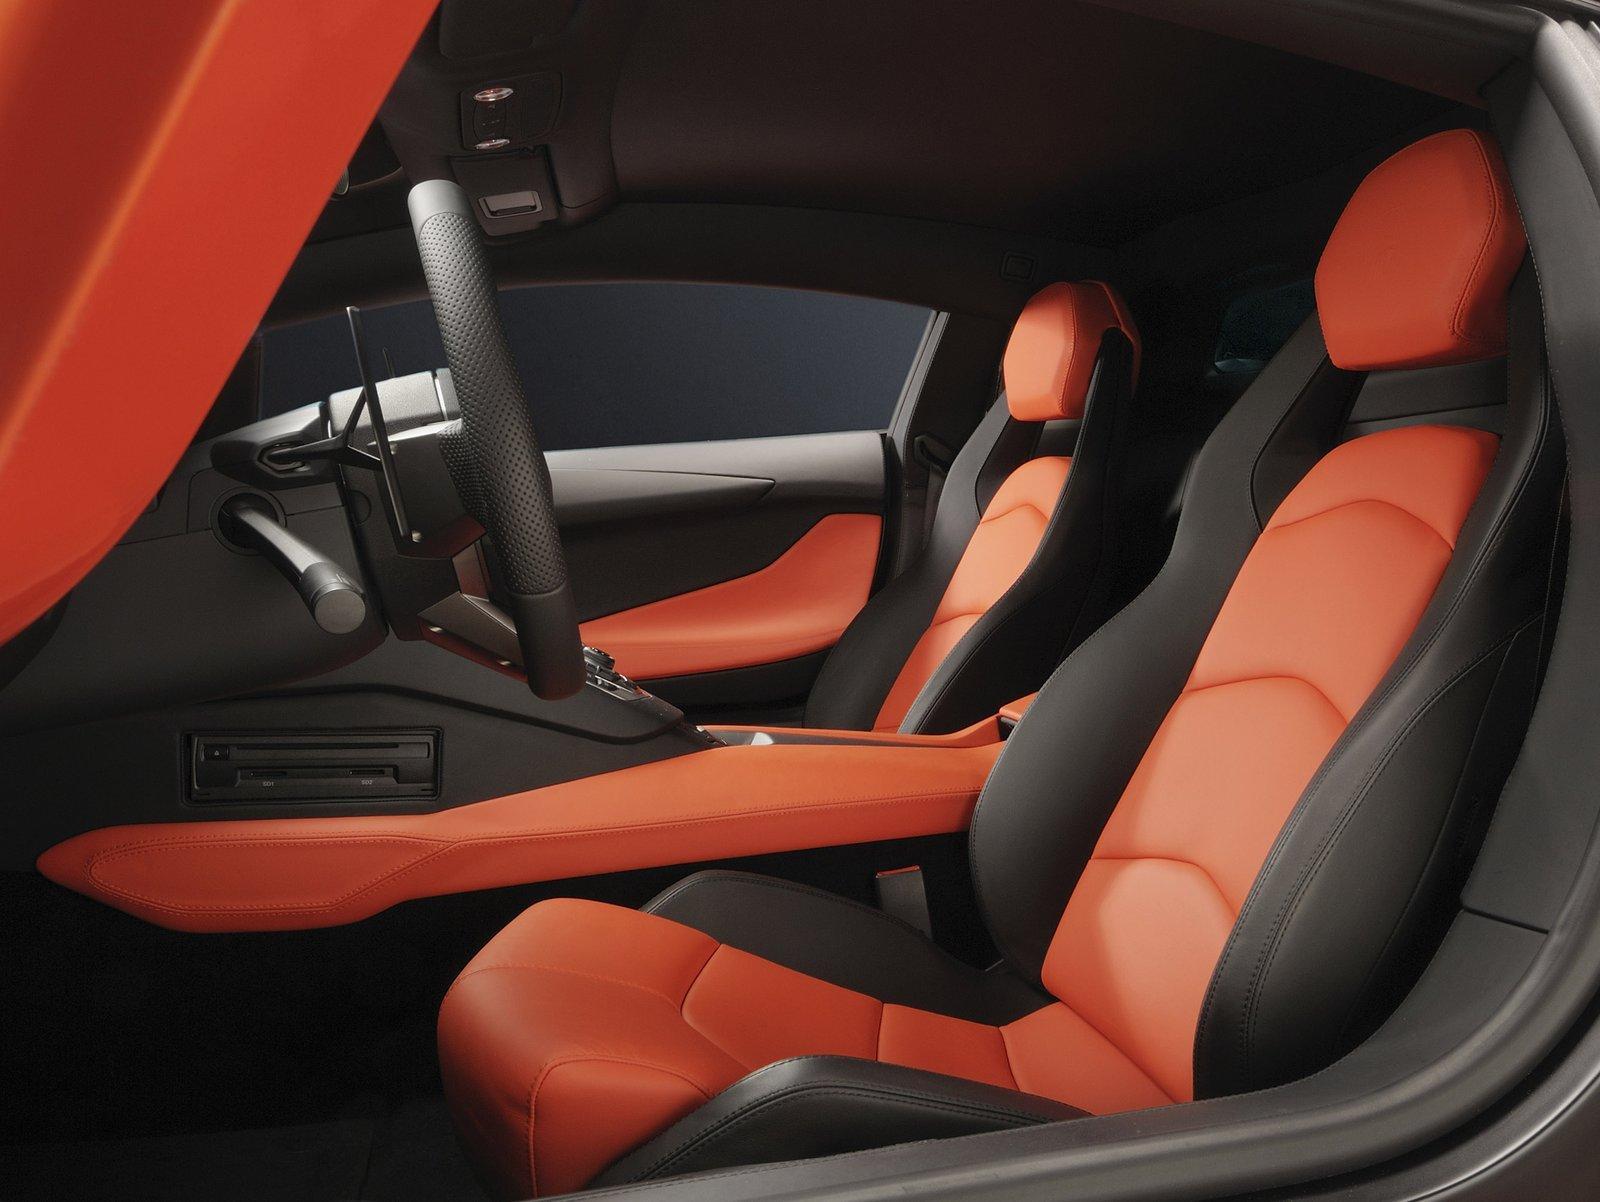 New Honda Pilot >> Lamborghini Aventador vs. F16 Fighting Falcon [HD video]